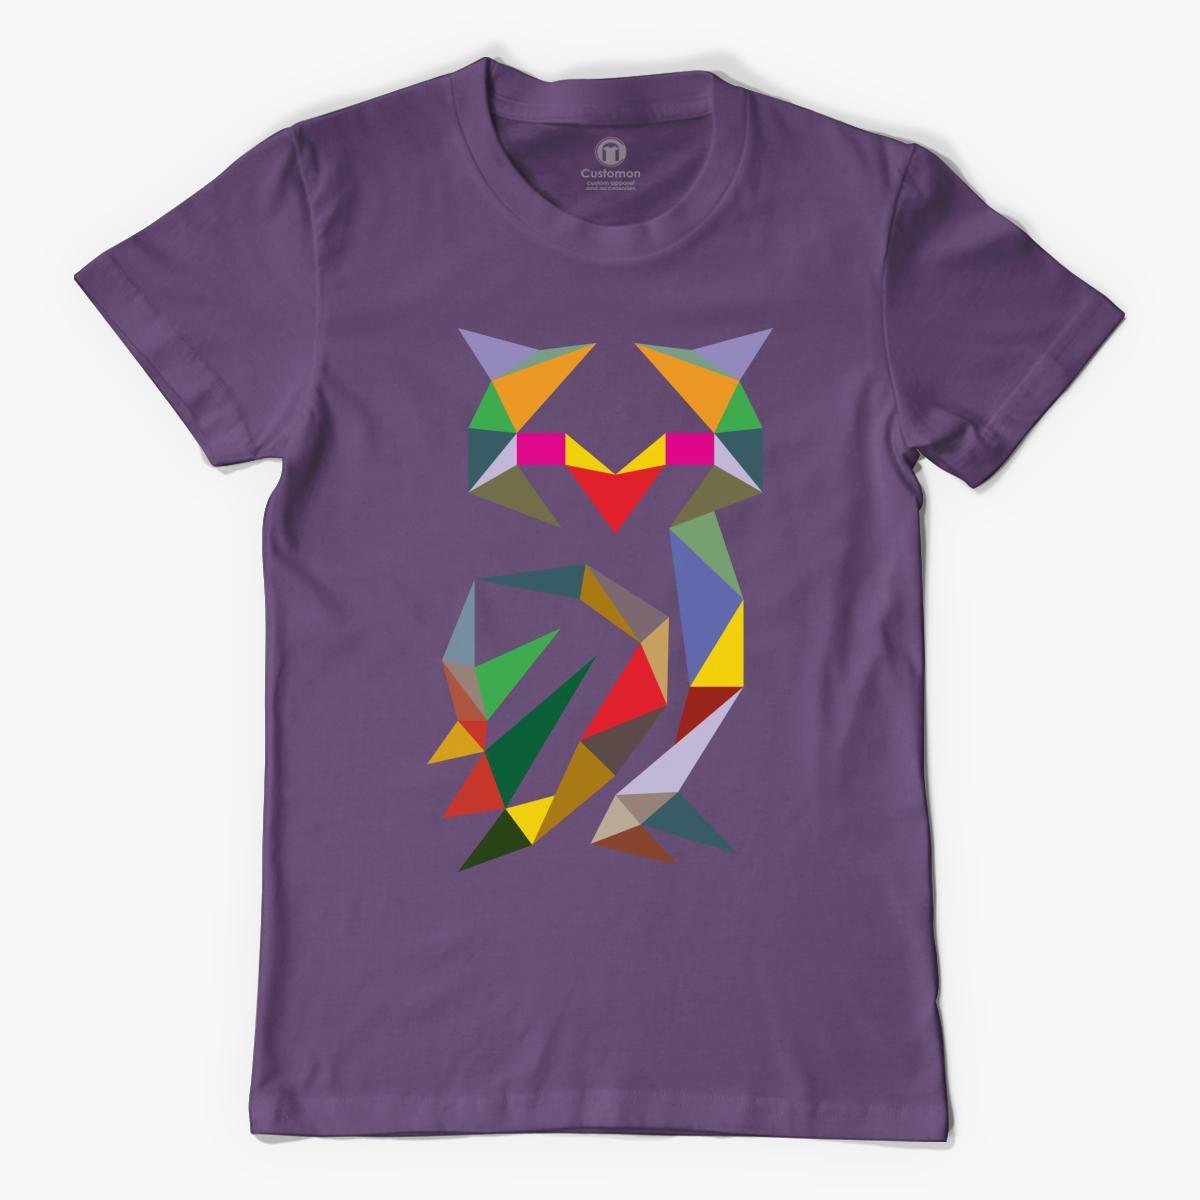 Geometric Owl Men's T-shirt - Customon